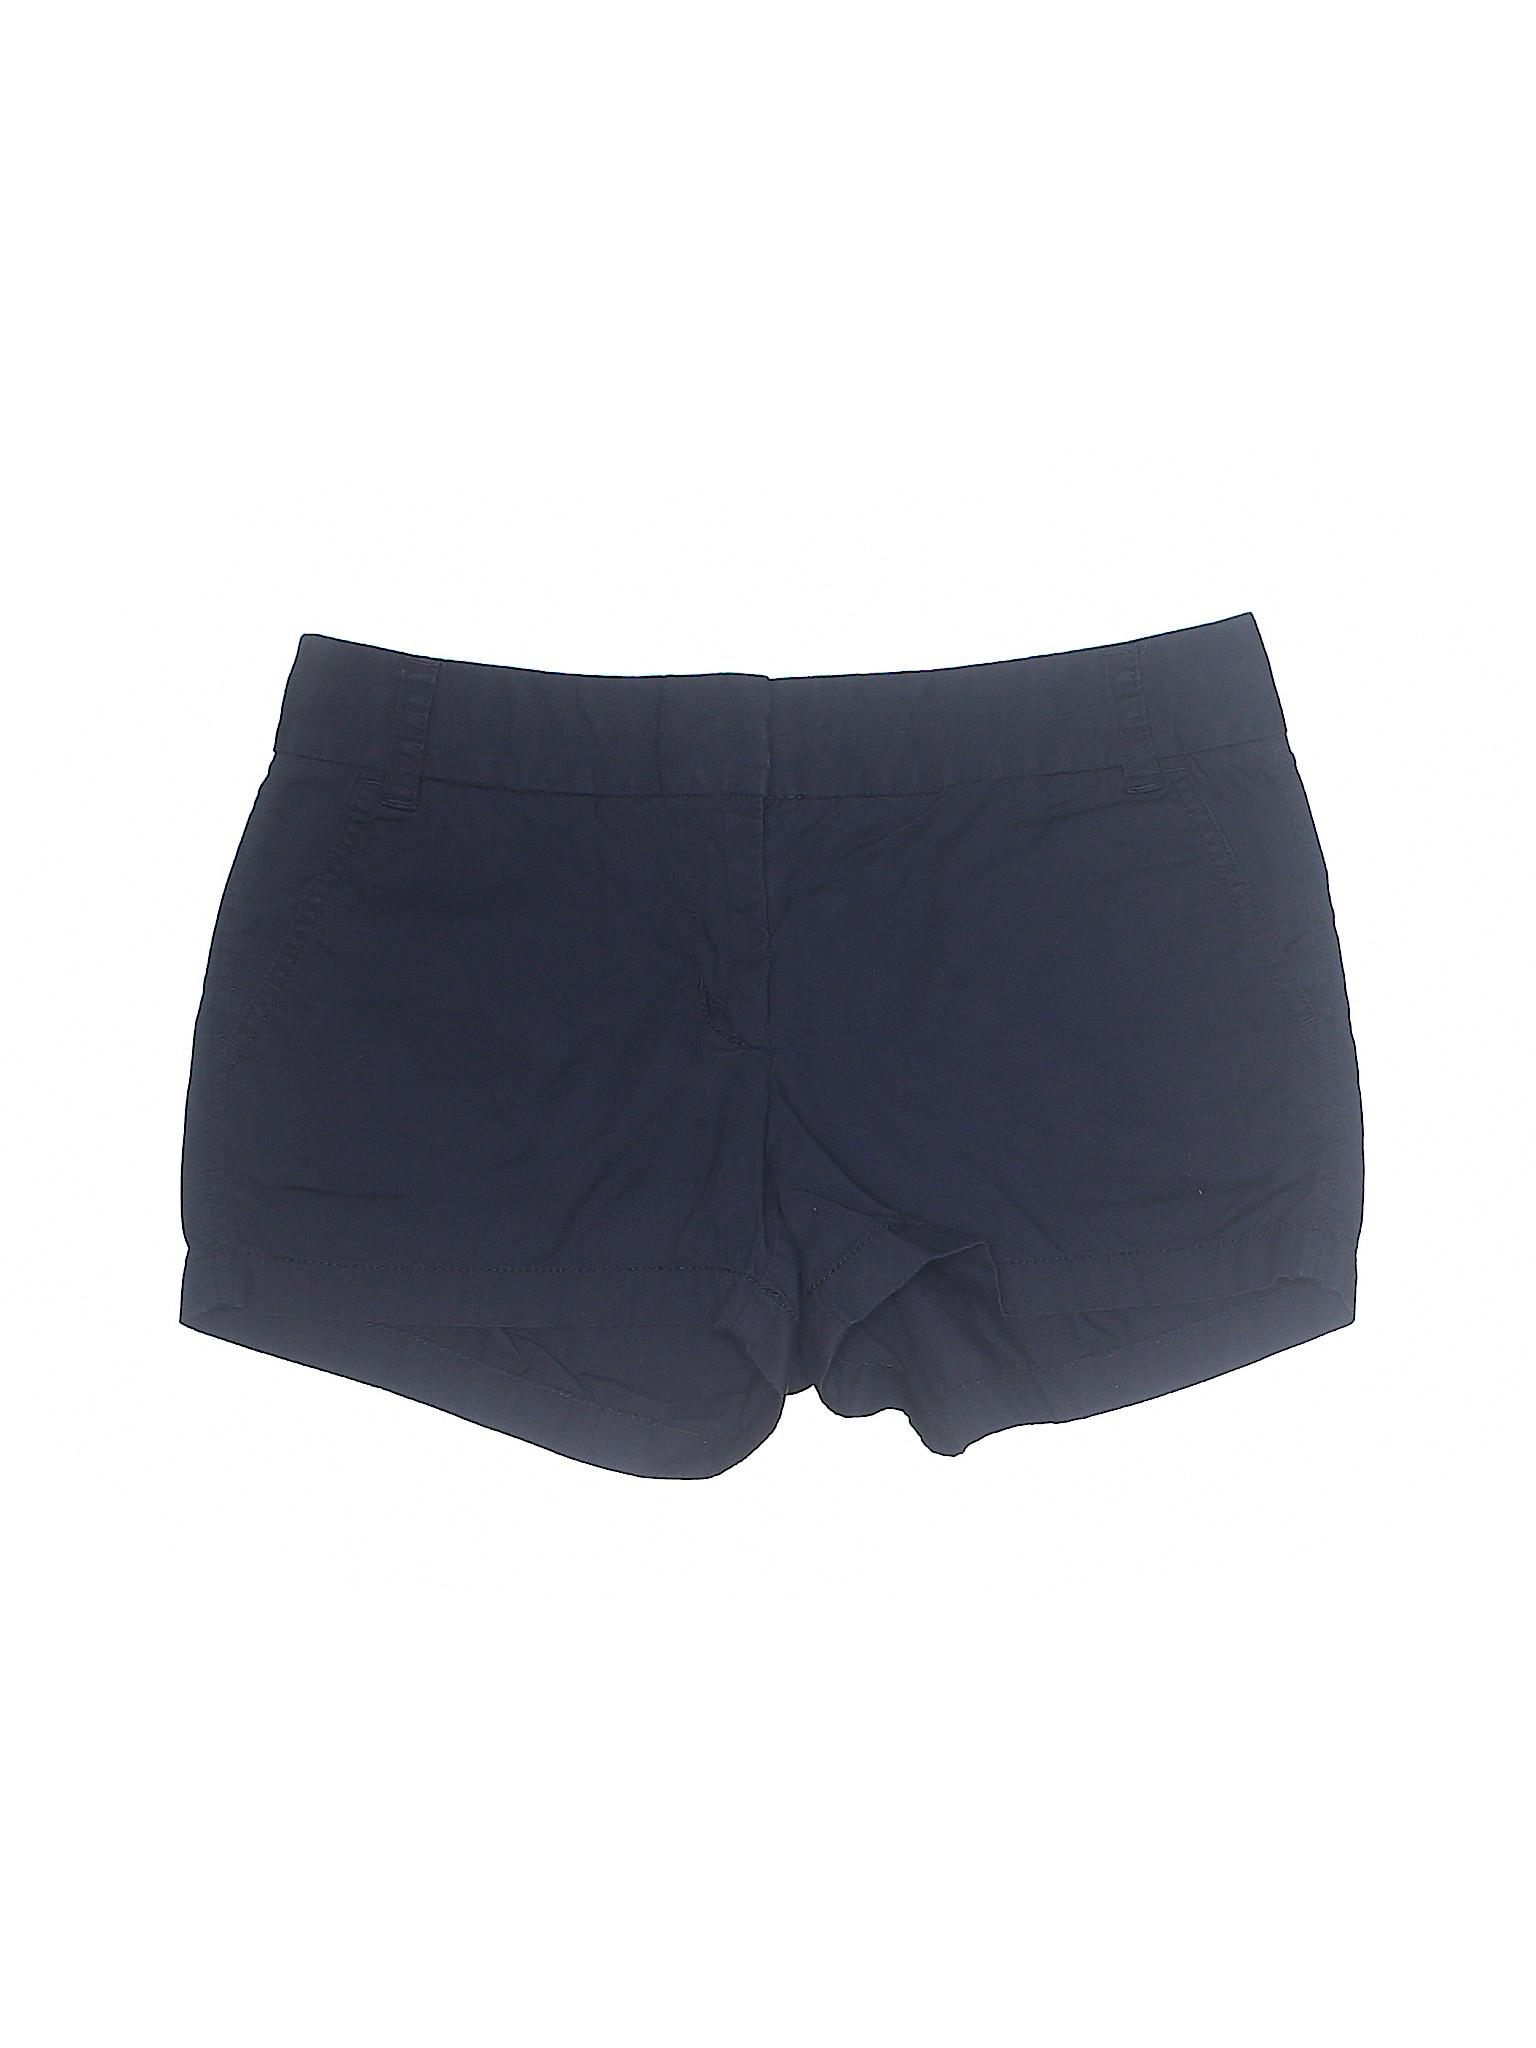 winter Shorts Crew Khaki J Boutique fzTUvO